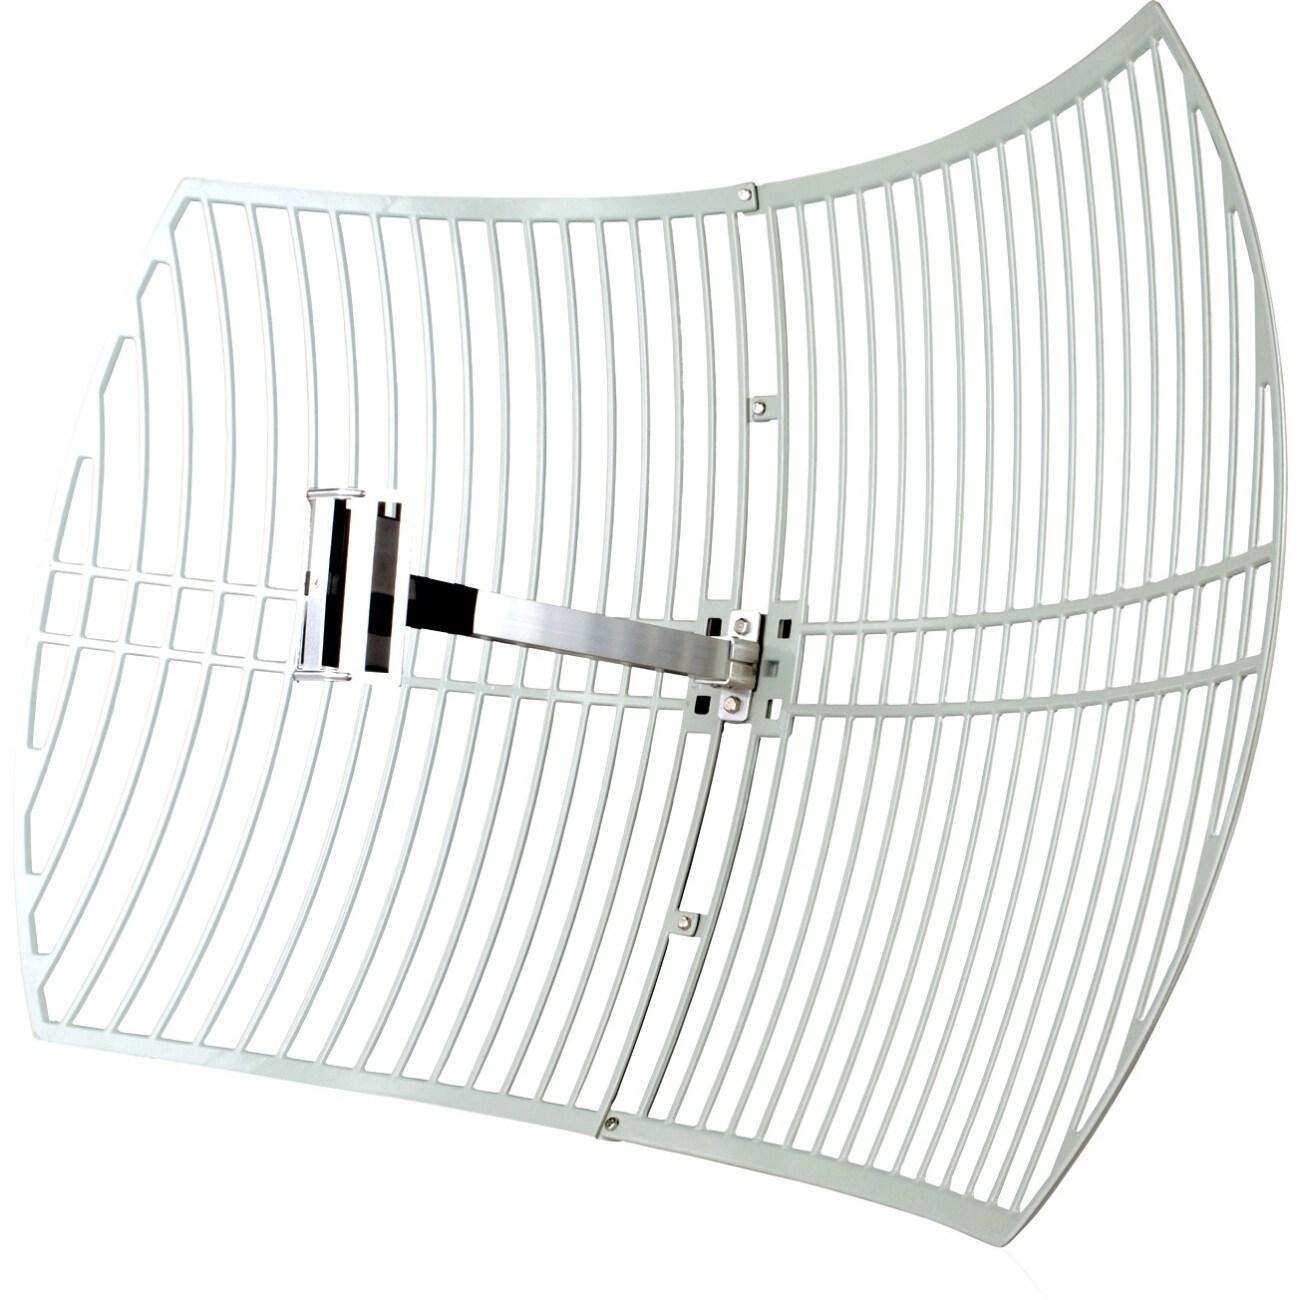 Shop TP LINK TL ANT2424B 24GHz 24dBi Directional Grid Parabolic Antenna